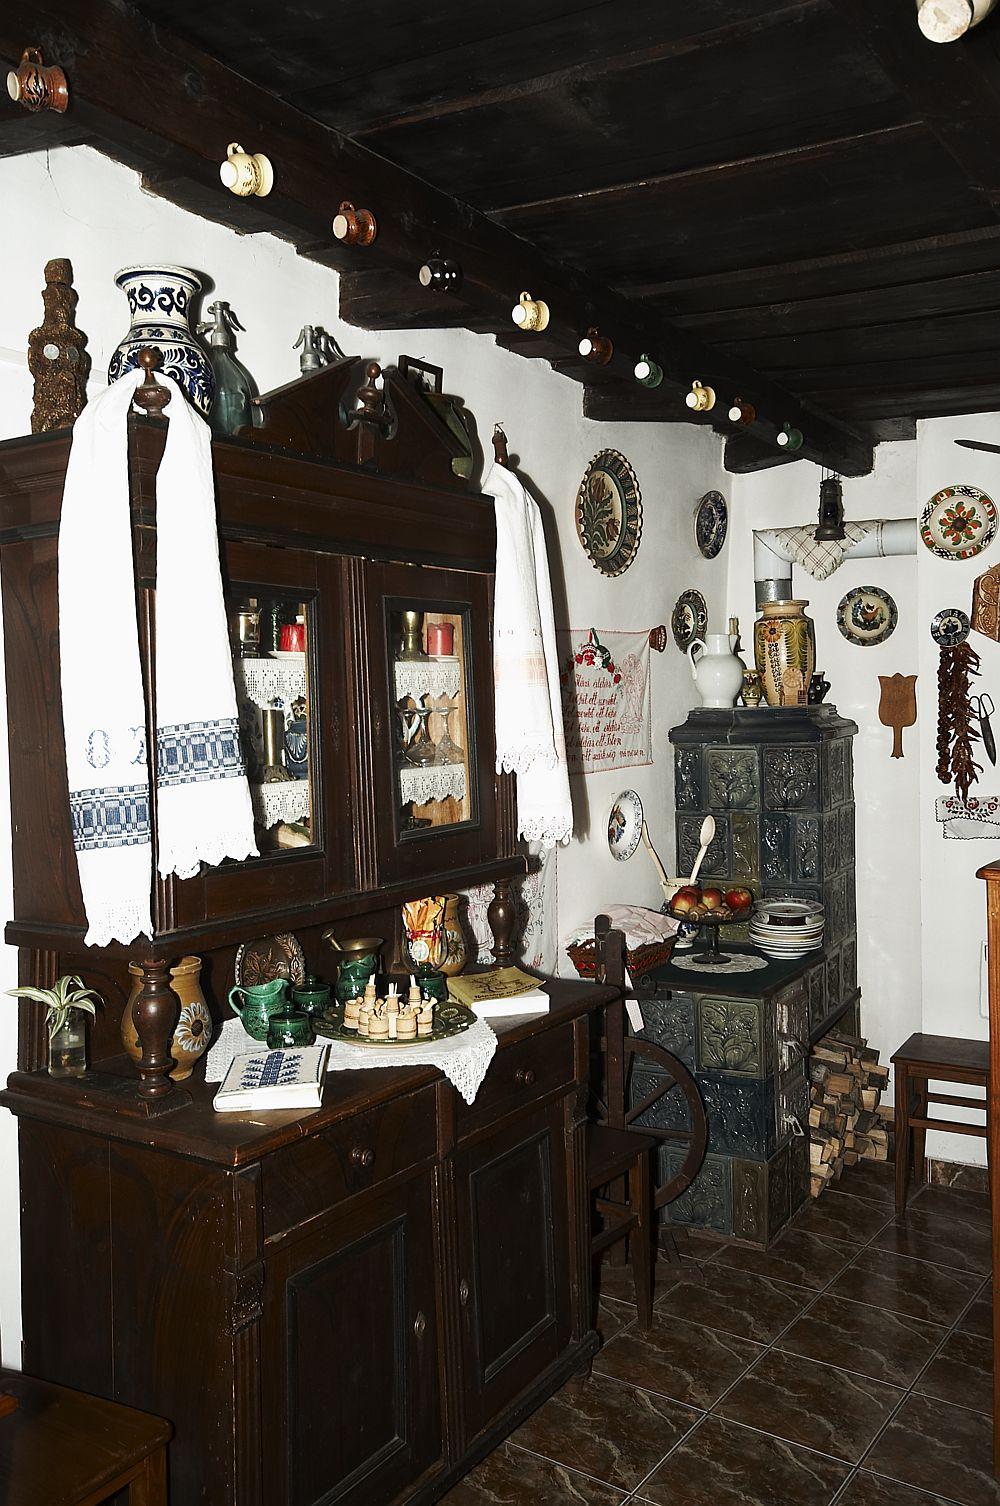 adelaparvu.com despre pensiune Stefania, Praid, Romania, Stefania bedandbreakfast, Transilvania, Praid, Romania (30)